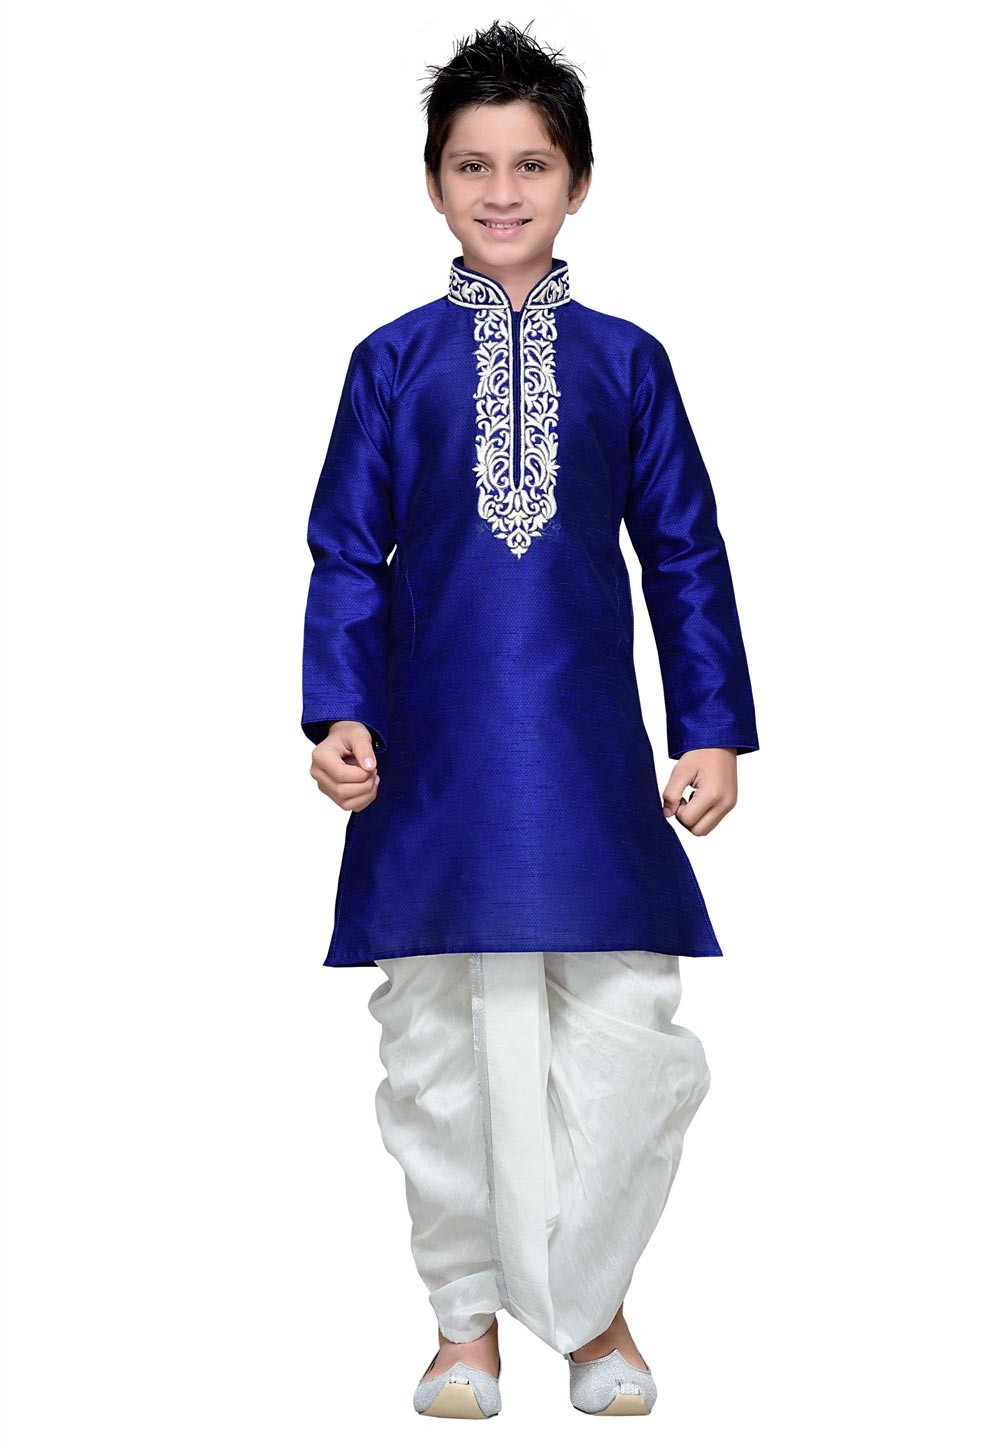 Blue Color Cotton Boy's Dhoti Kurta.